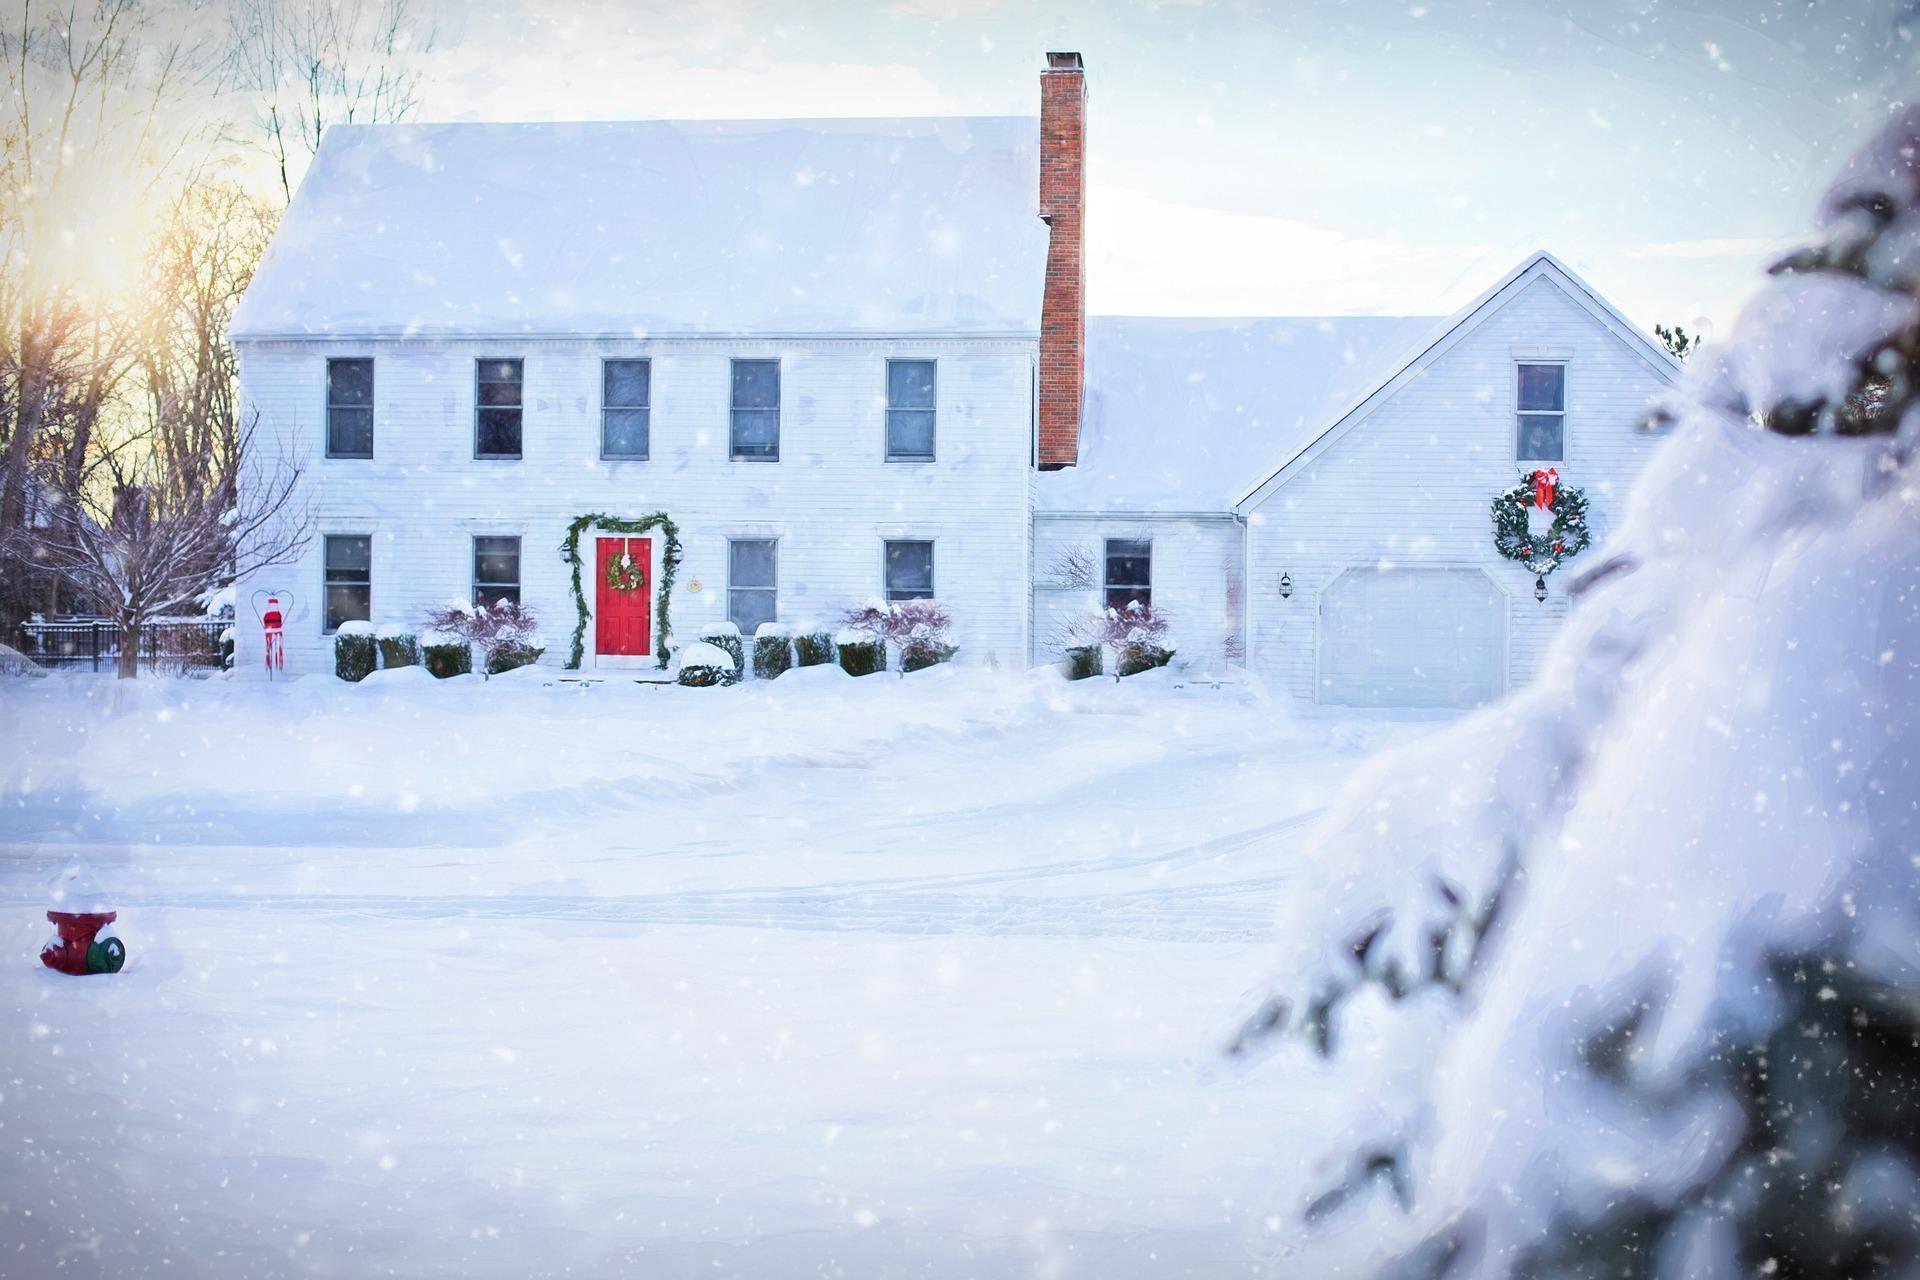 christmas-house-1913902_1920.jpg